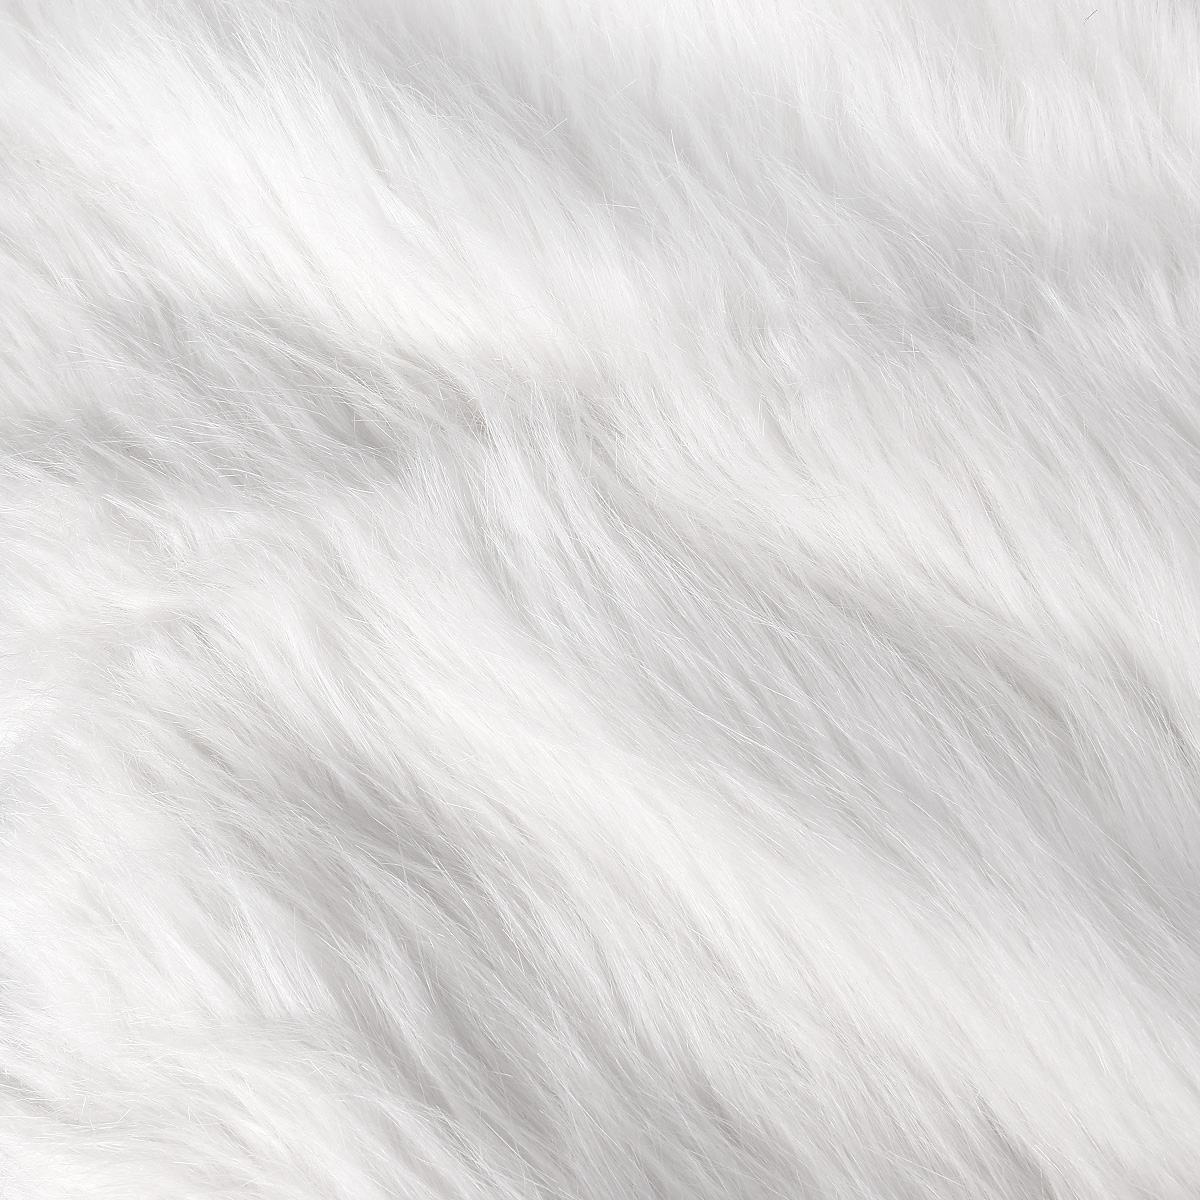 white luxury shag faux fur shaggy long hair pile fabric 100x155cm ebay. Black Bedroom Furniture Sets. Home Design Ideas